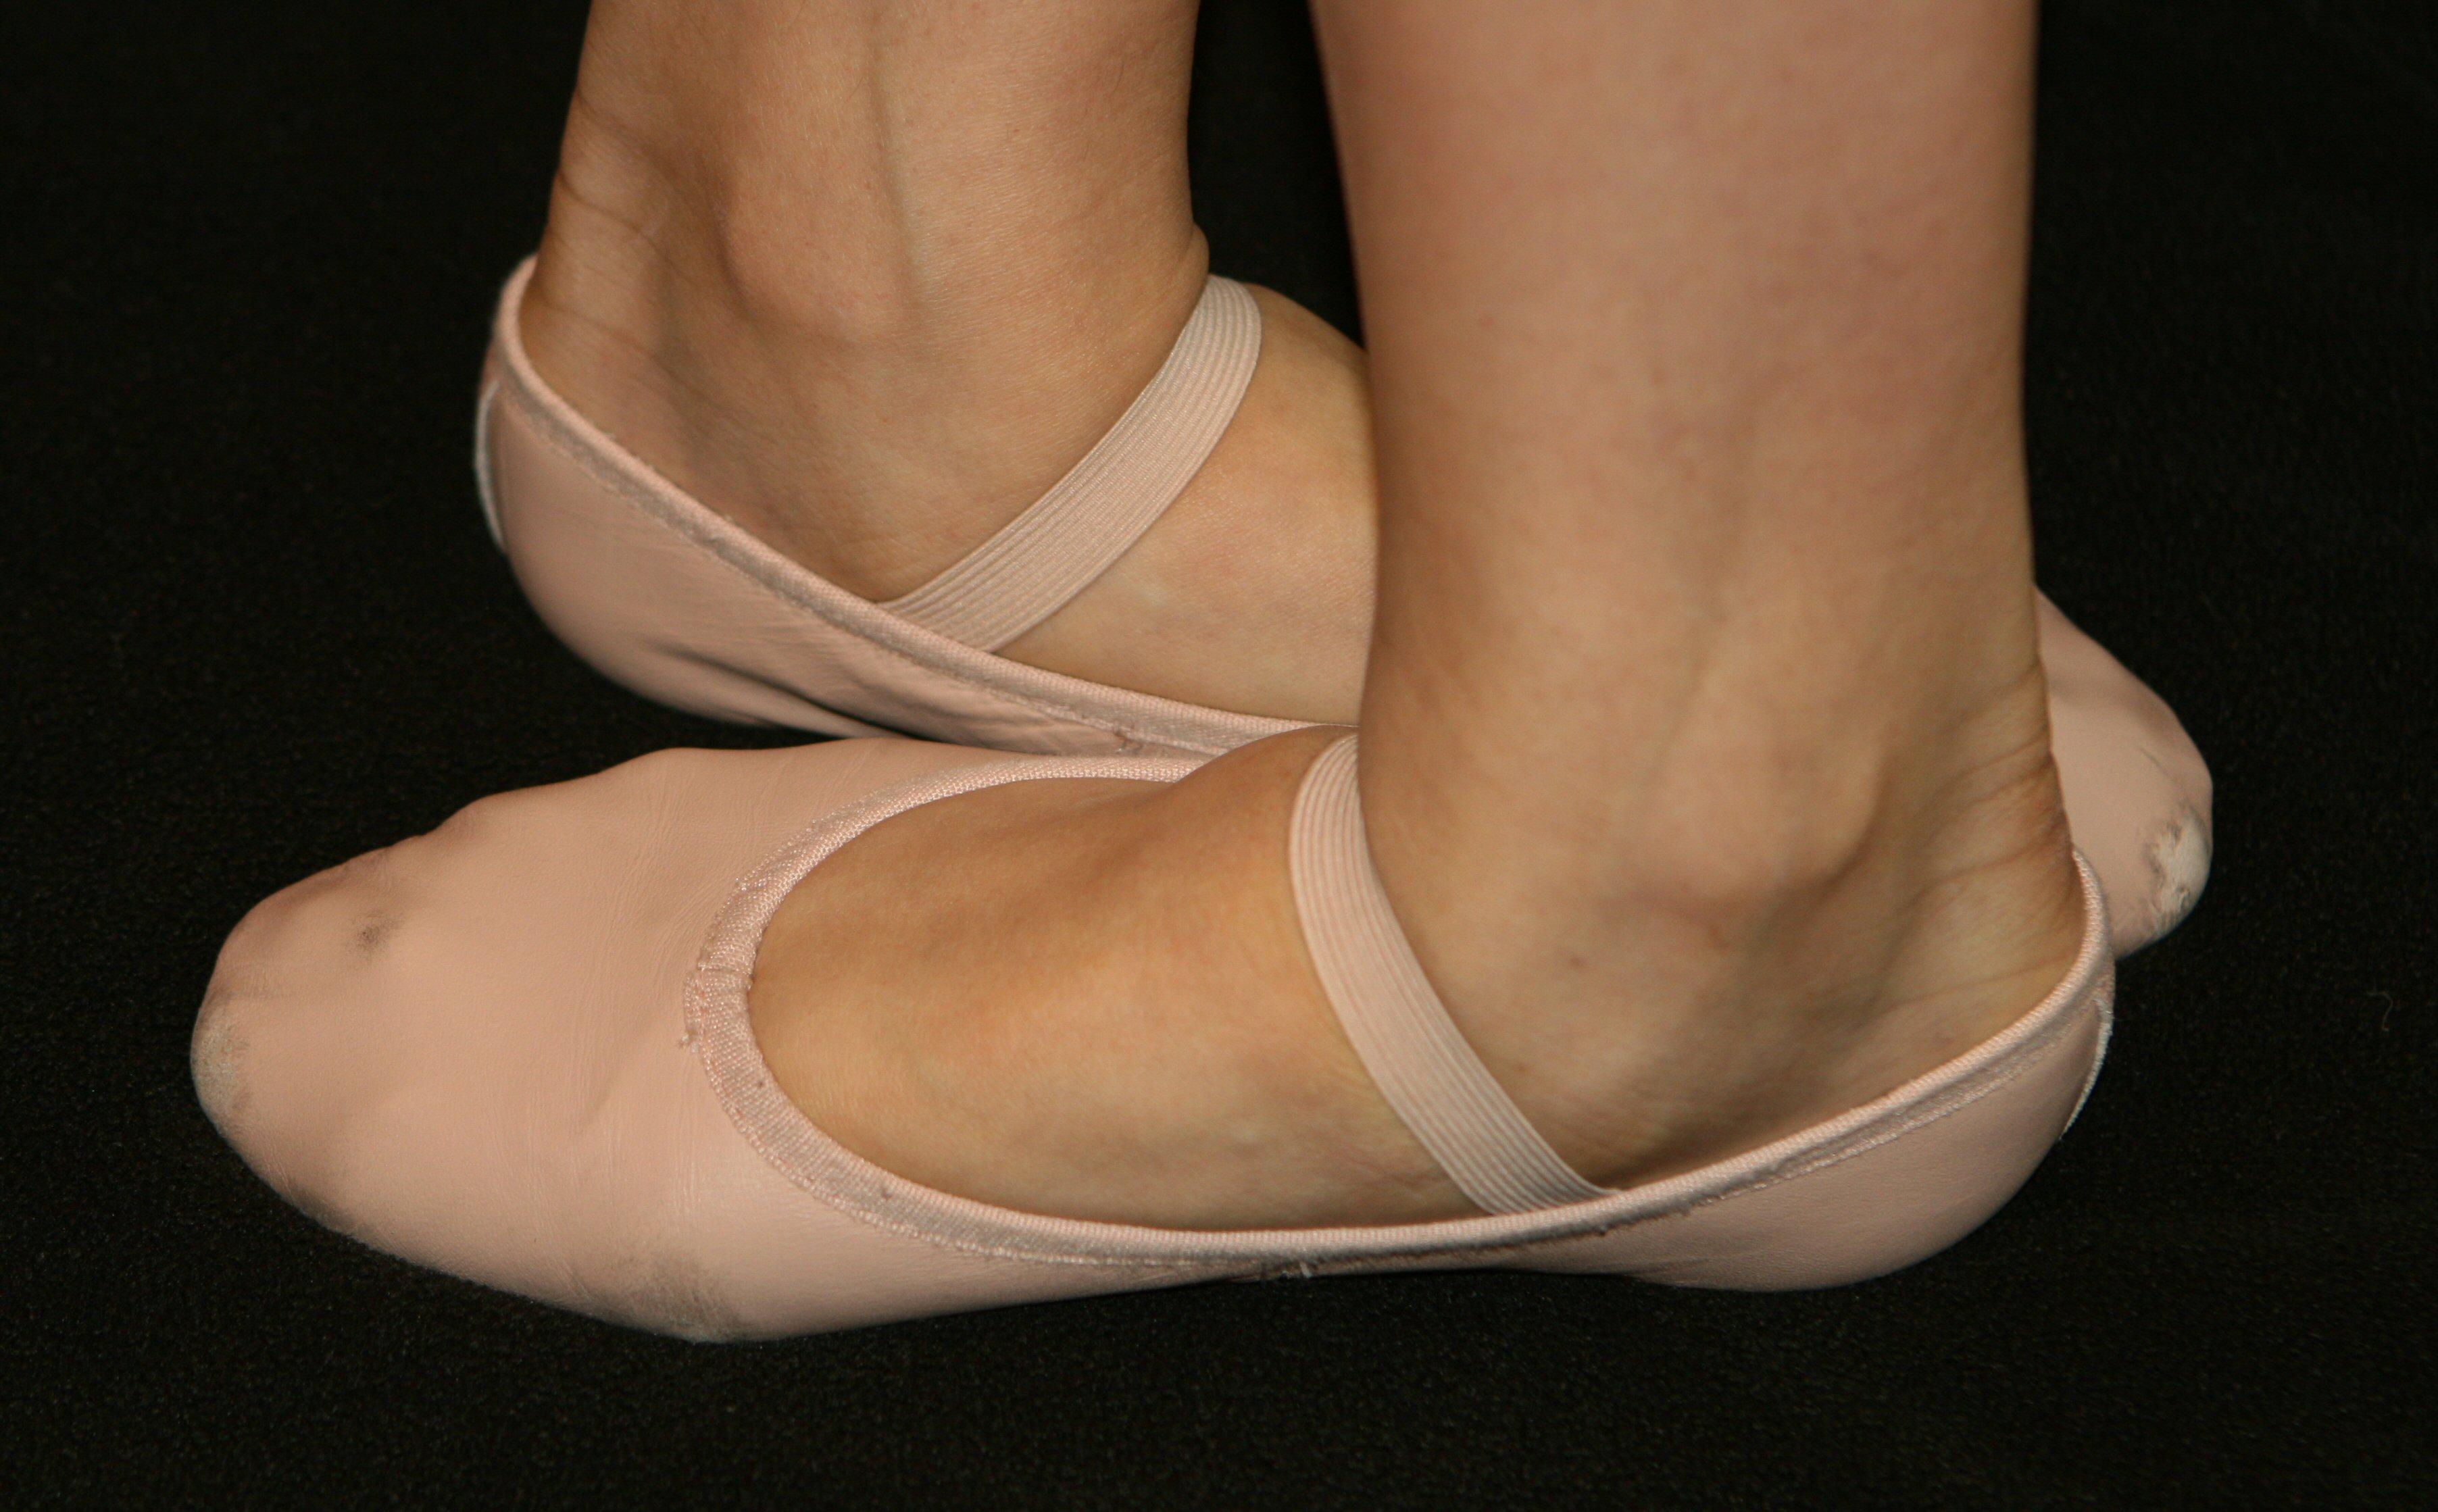 6ad4998b031e Ballet shoe - Wikipedia